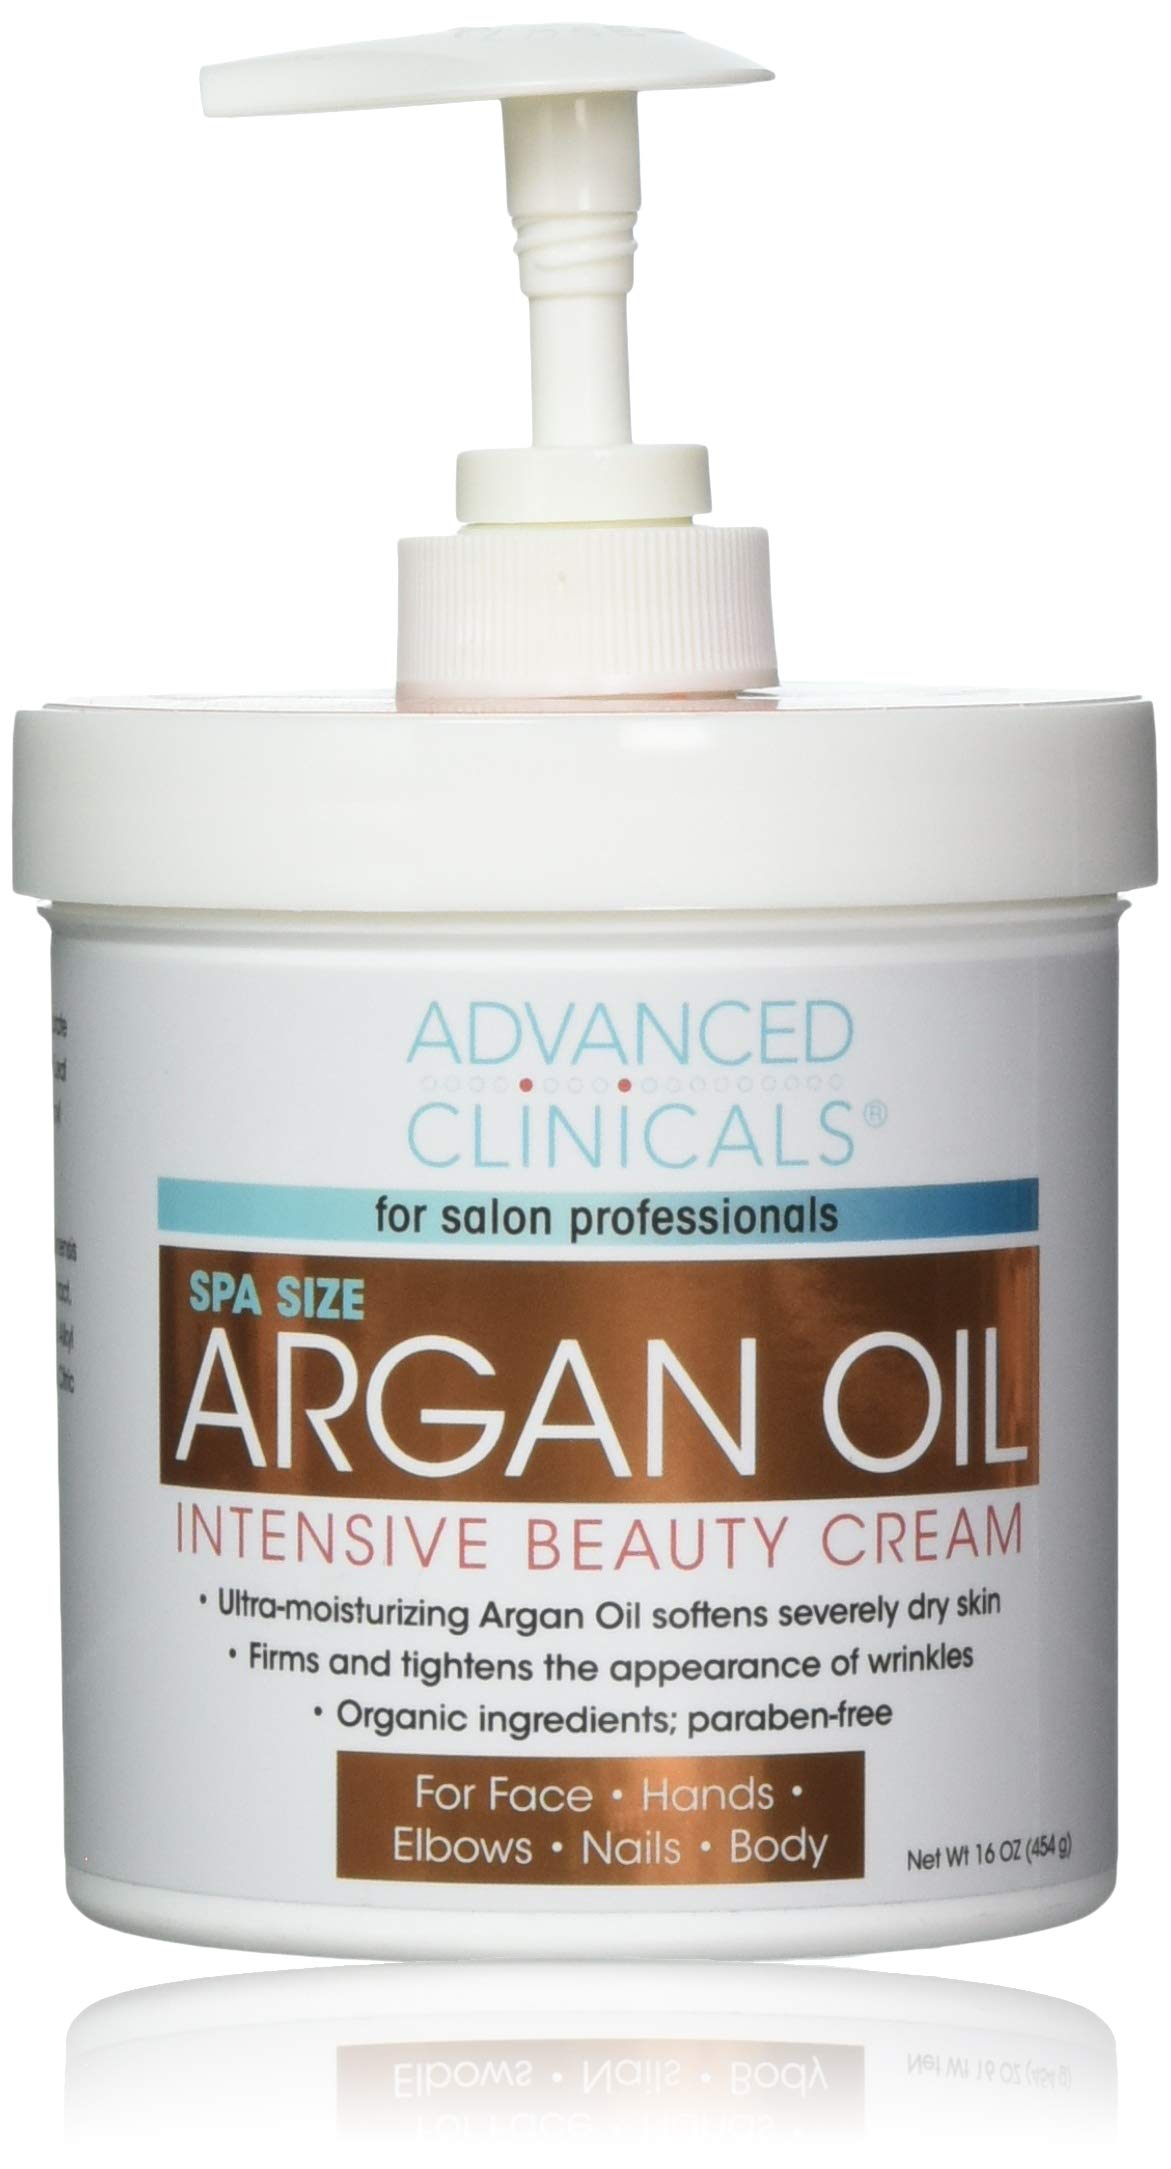 Advanced Clinicals Spa Size Pure Argan Oil Intensive Beauty Cream